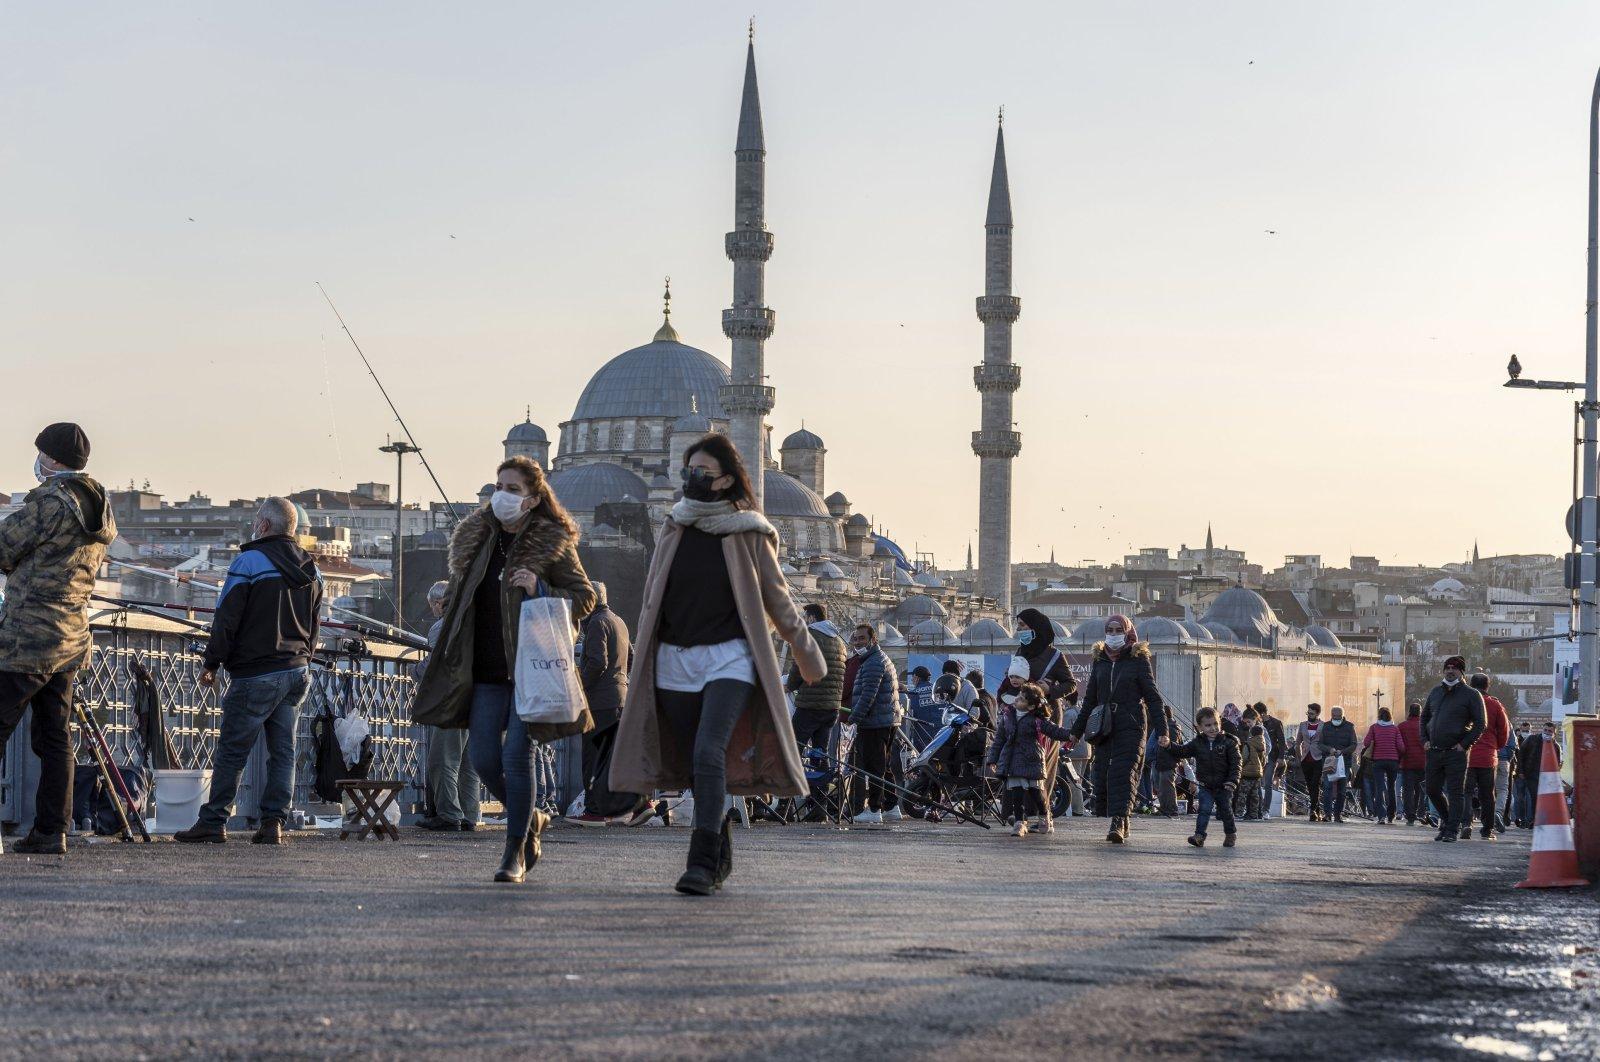 Turkish people wearing protective face masks walking at Galata bridge during coronavirus COVID-19 pandemic in Istanbul, Turkey on Nov. 16, 2020. (Getty File Photo)